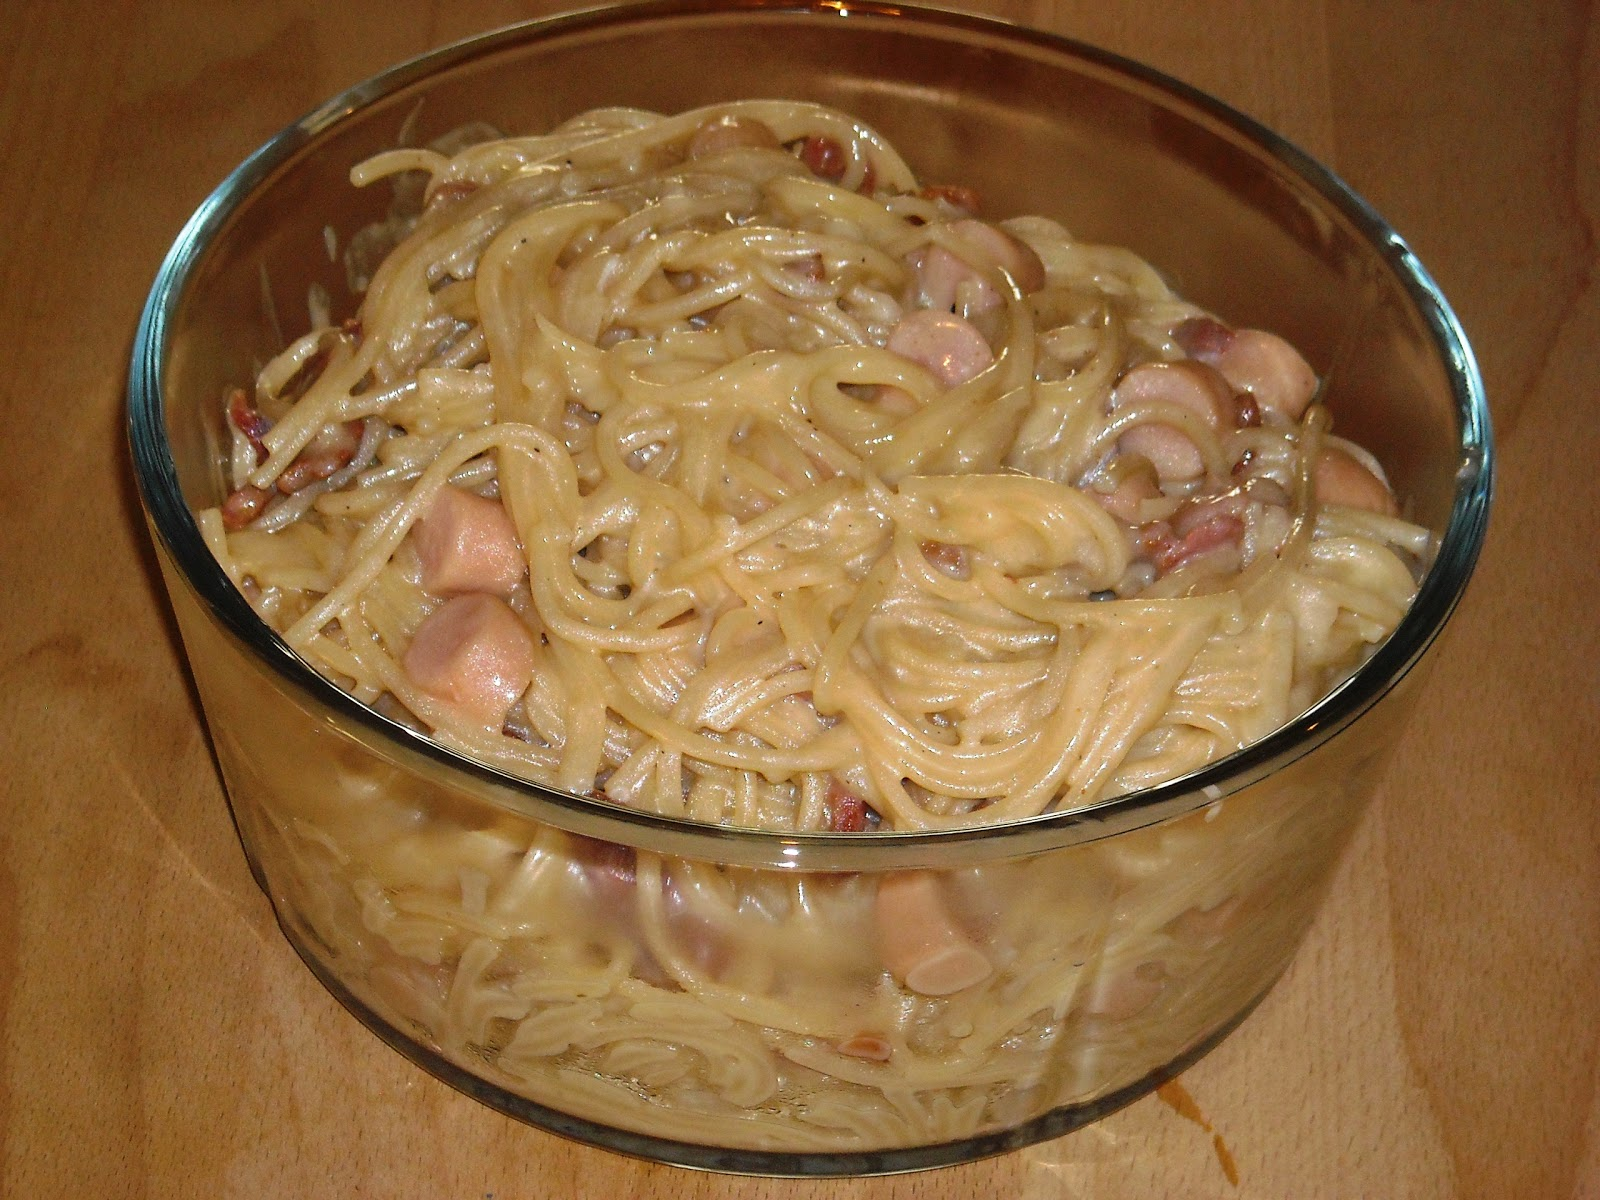 karolines køkken carbonara sauce